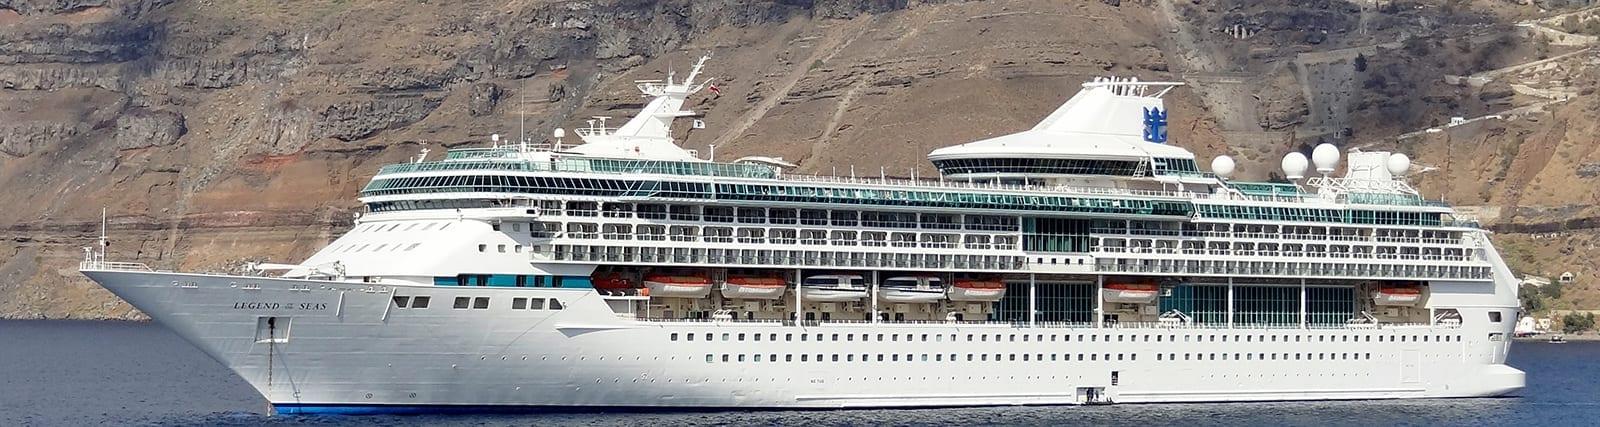 Legend of the seas cruise